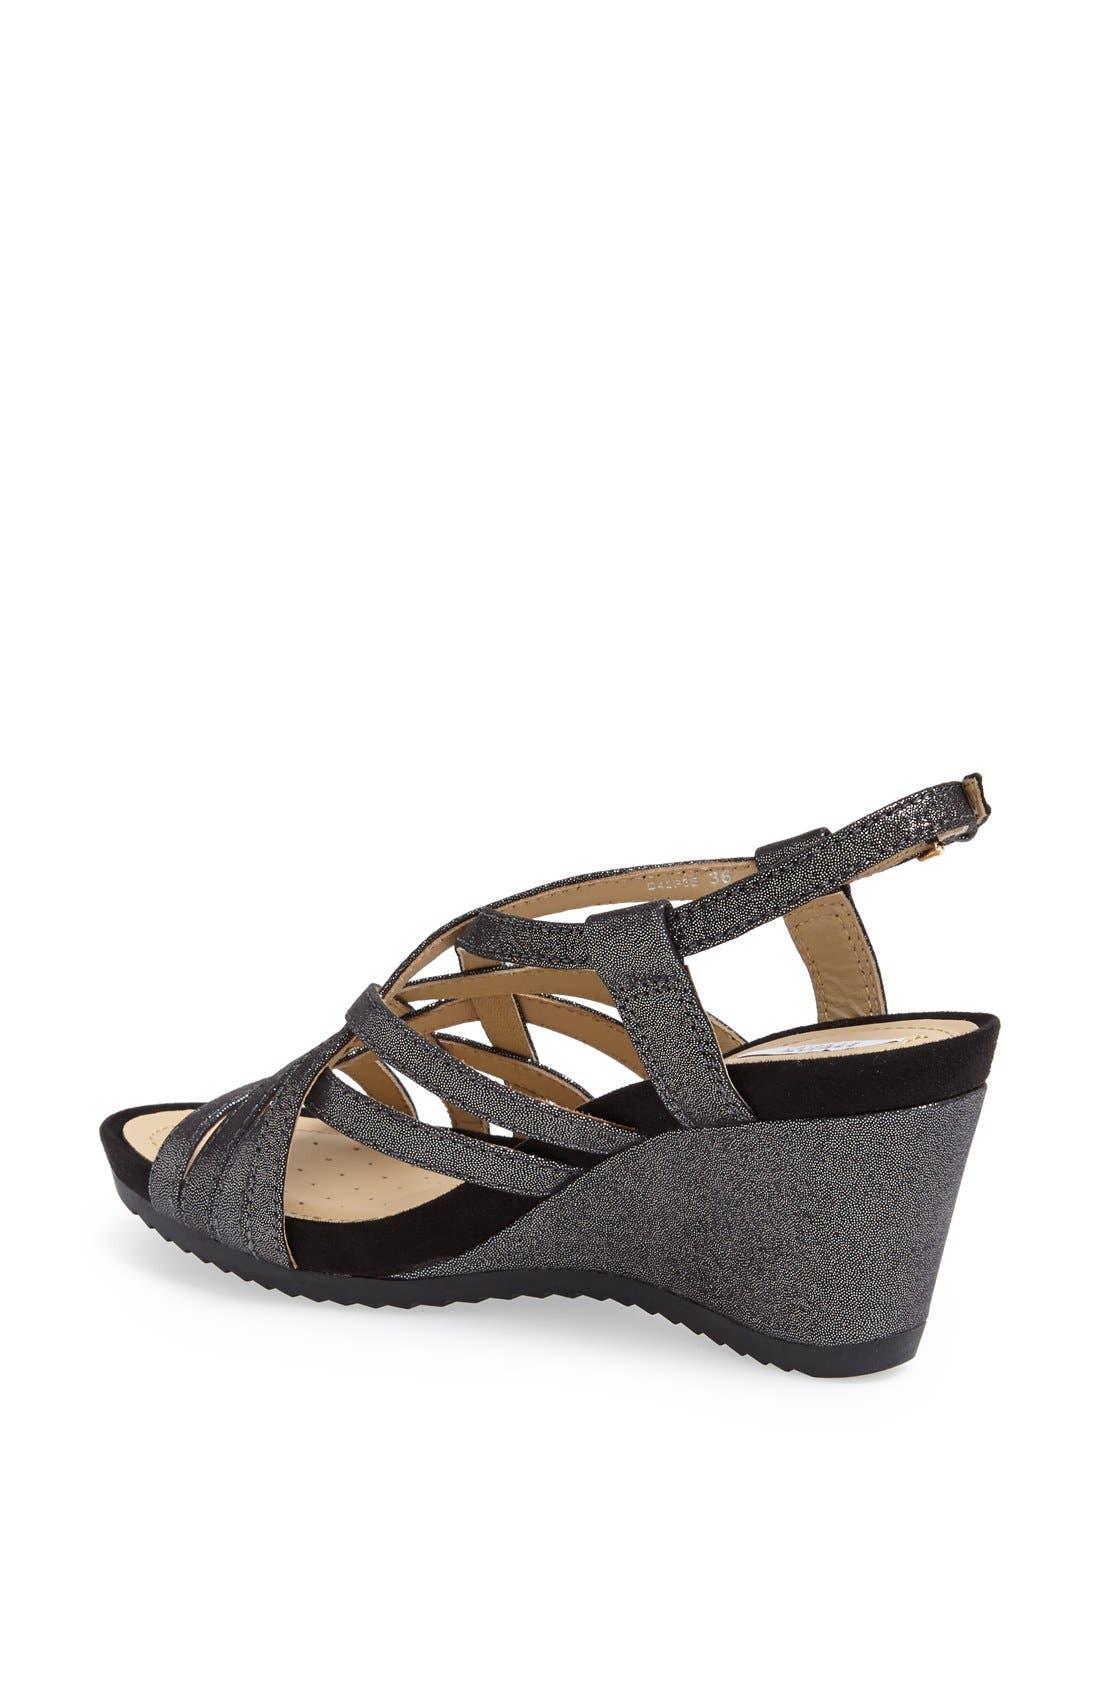 Alternate Image 2  - Geox 'Roxy' Metallic Leather Sandal (Women)